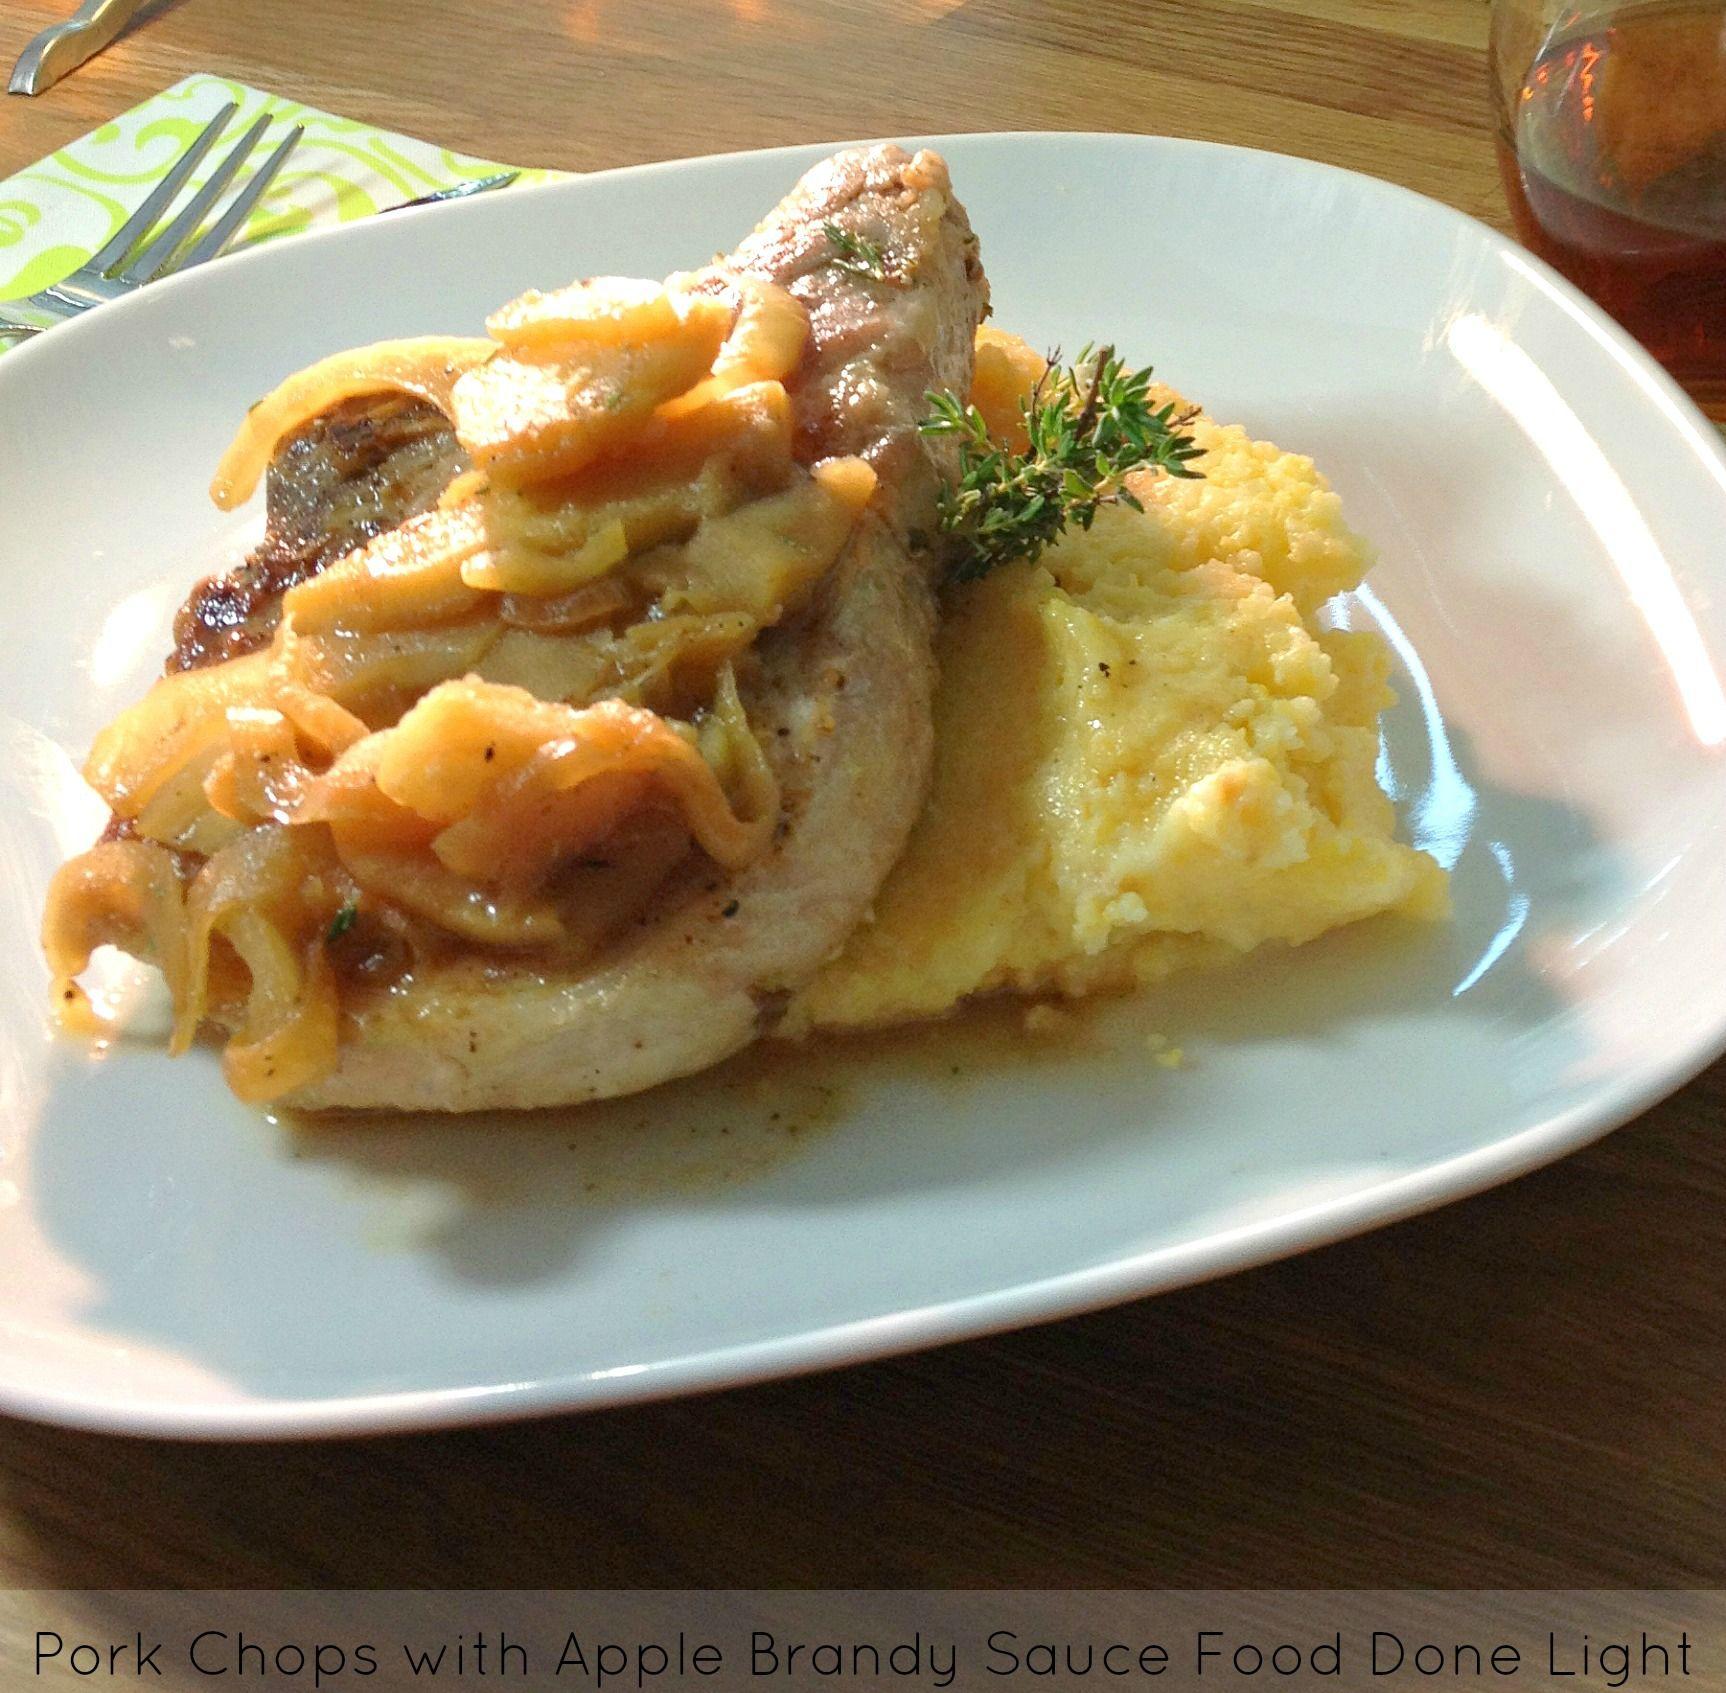 Pork Chops with Apple Brandy Sauce www.fooddonelight.com #porkrecipe #applerecipe #skilletdinner